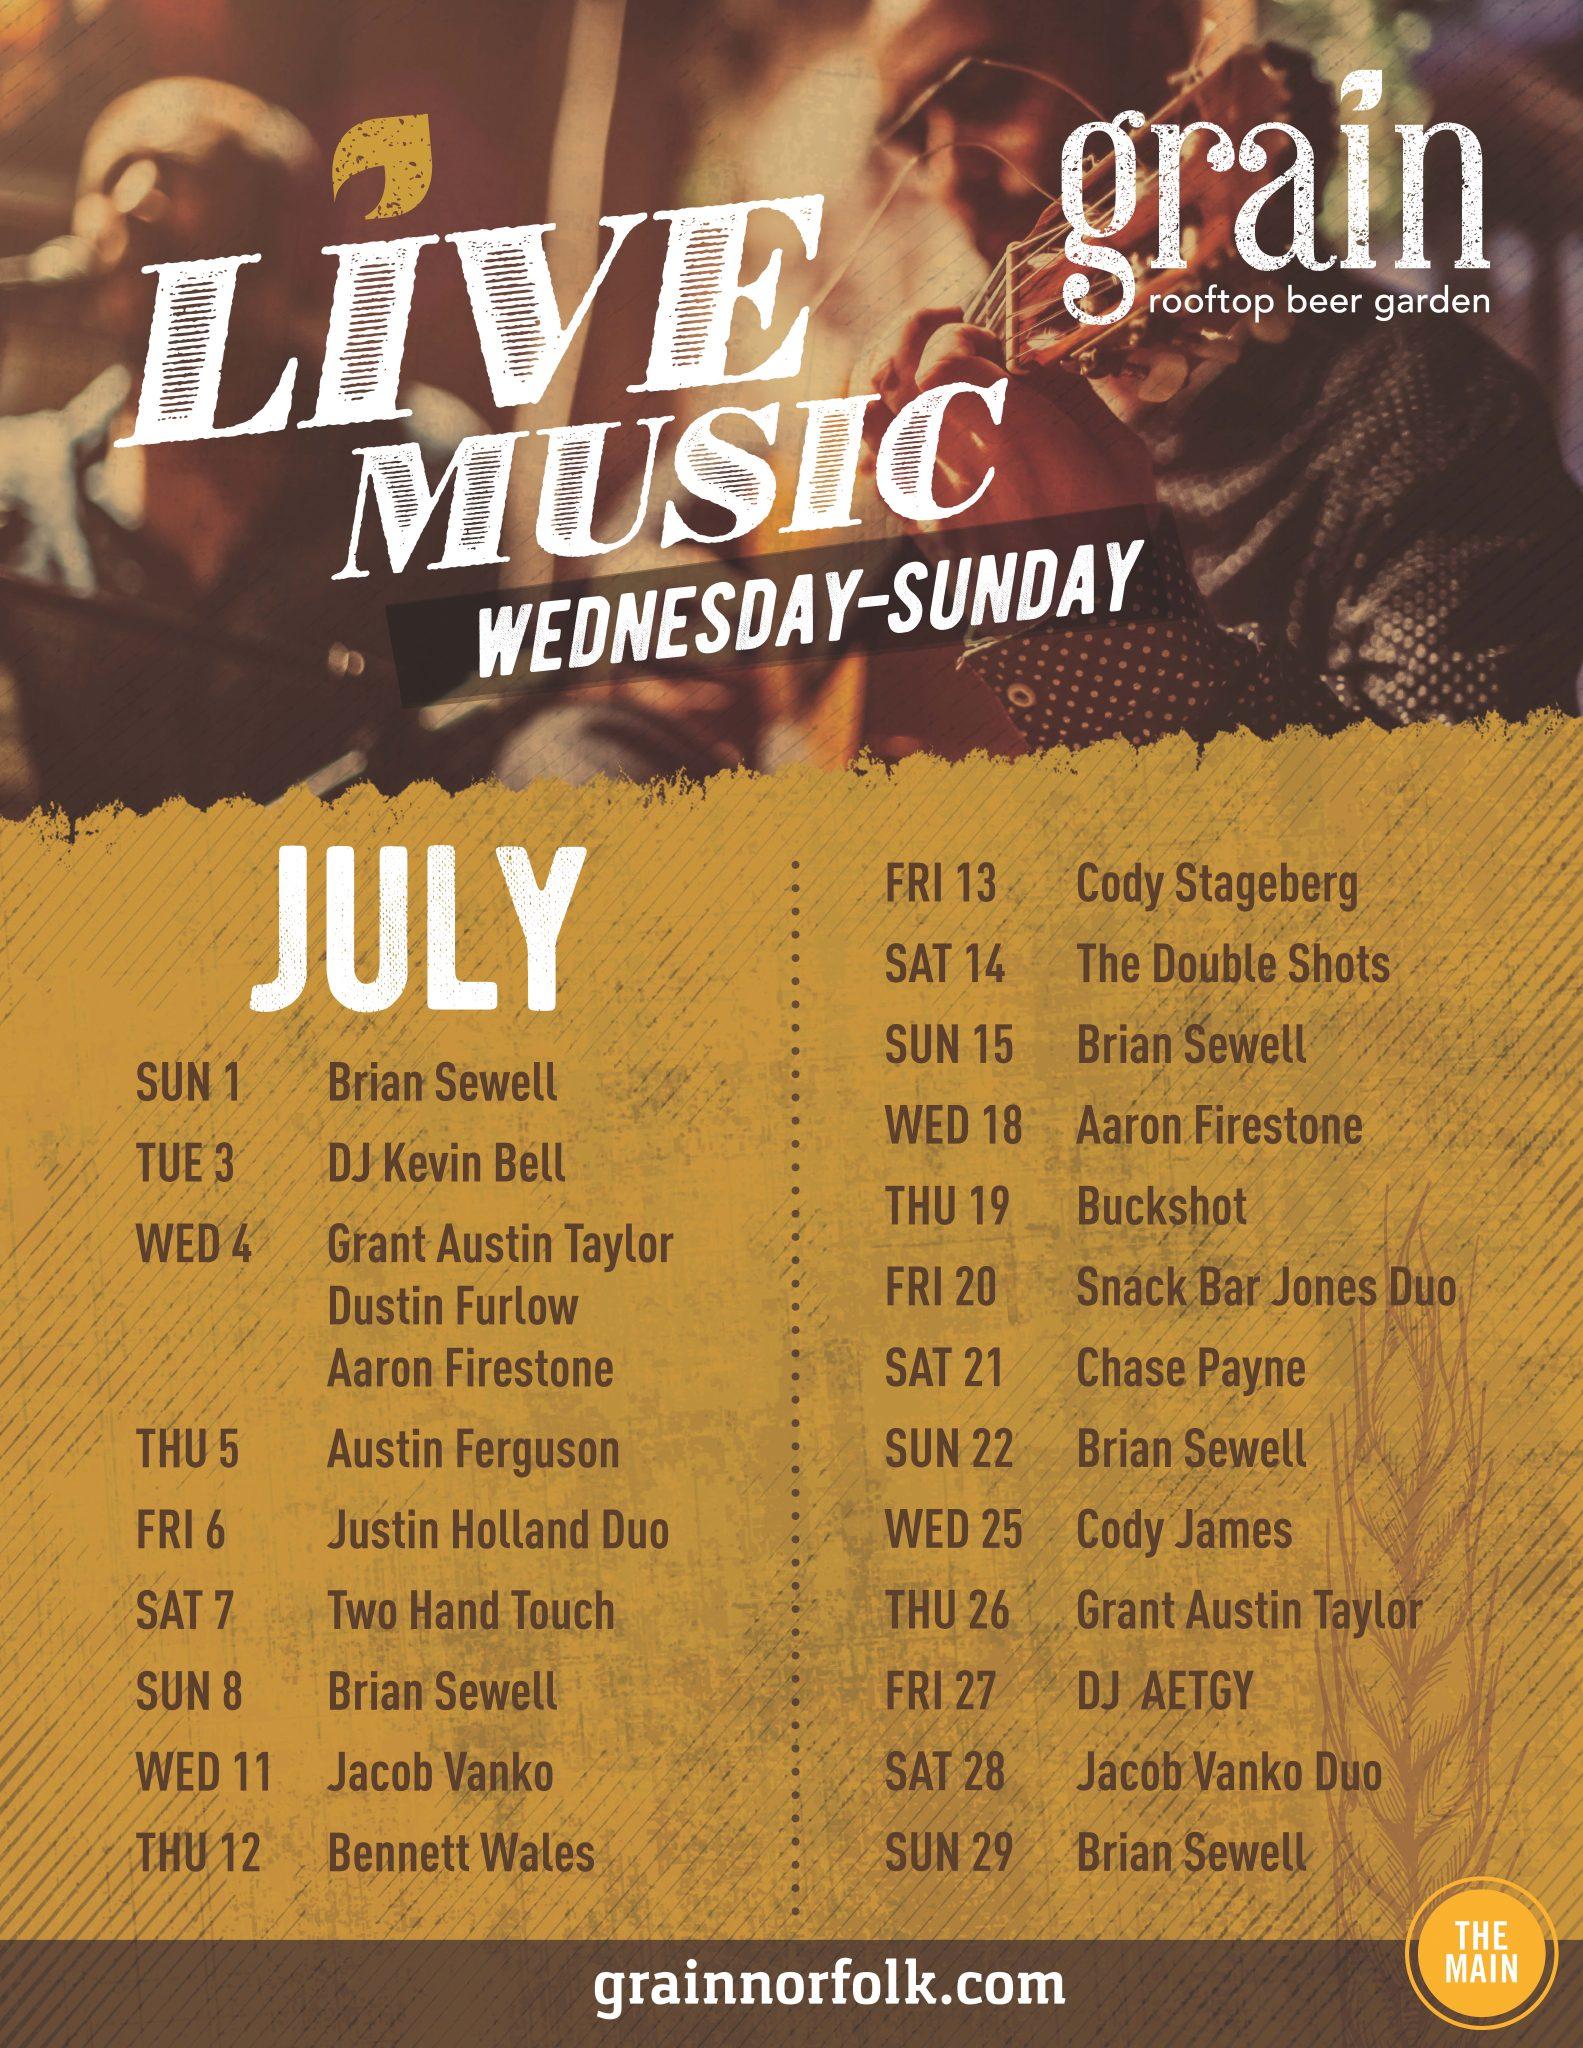 GRAIN_4522 JULY Entertainment Calendar Flyer_web